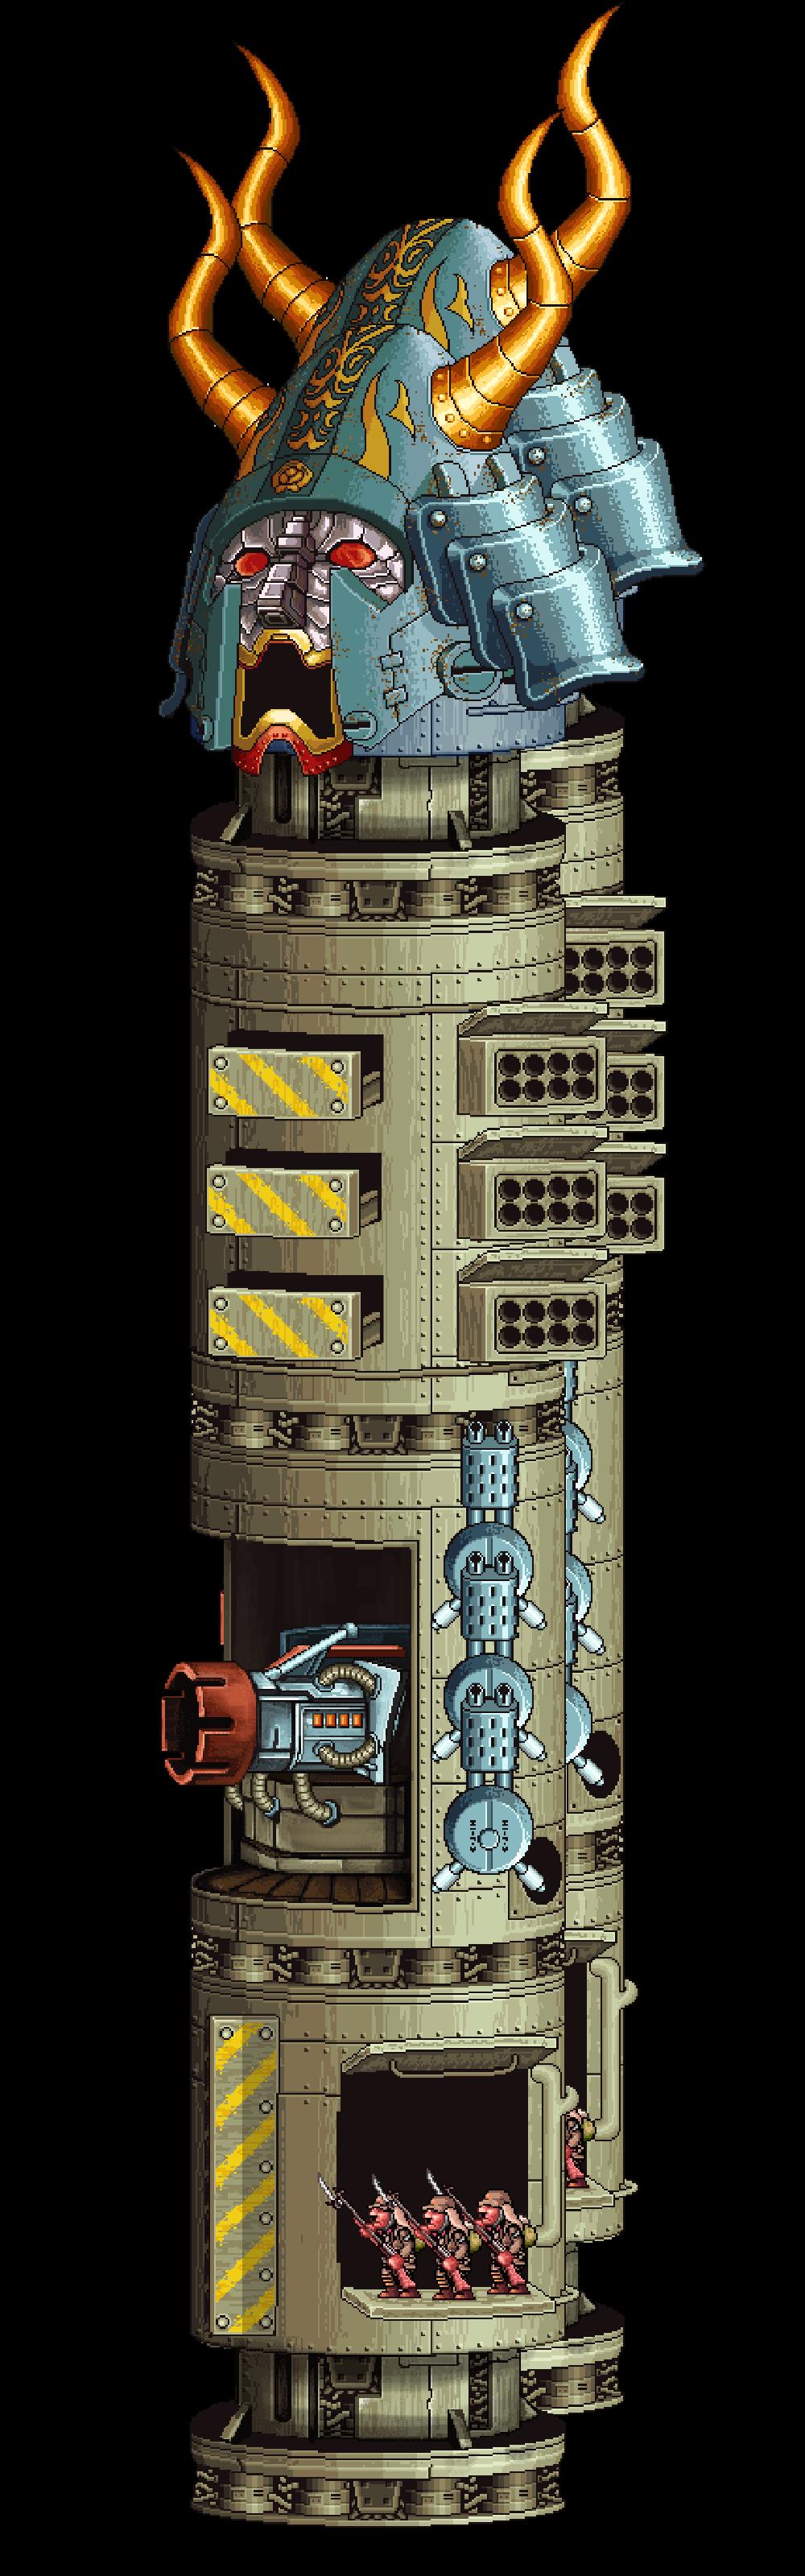 Commando_2_Final_Boss_Rocket.png